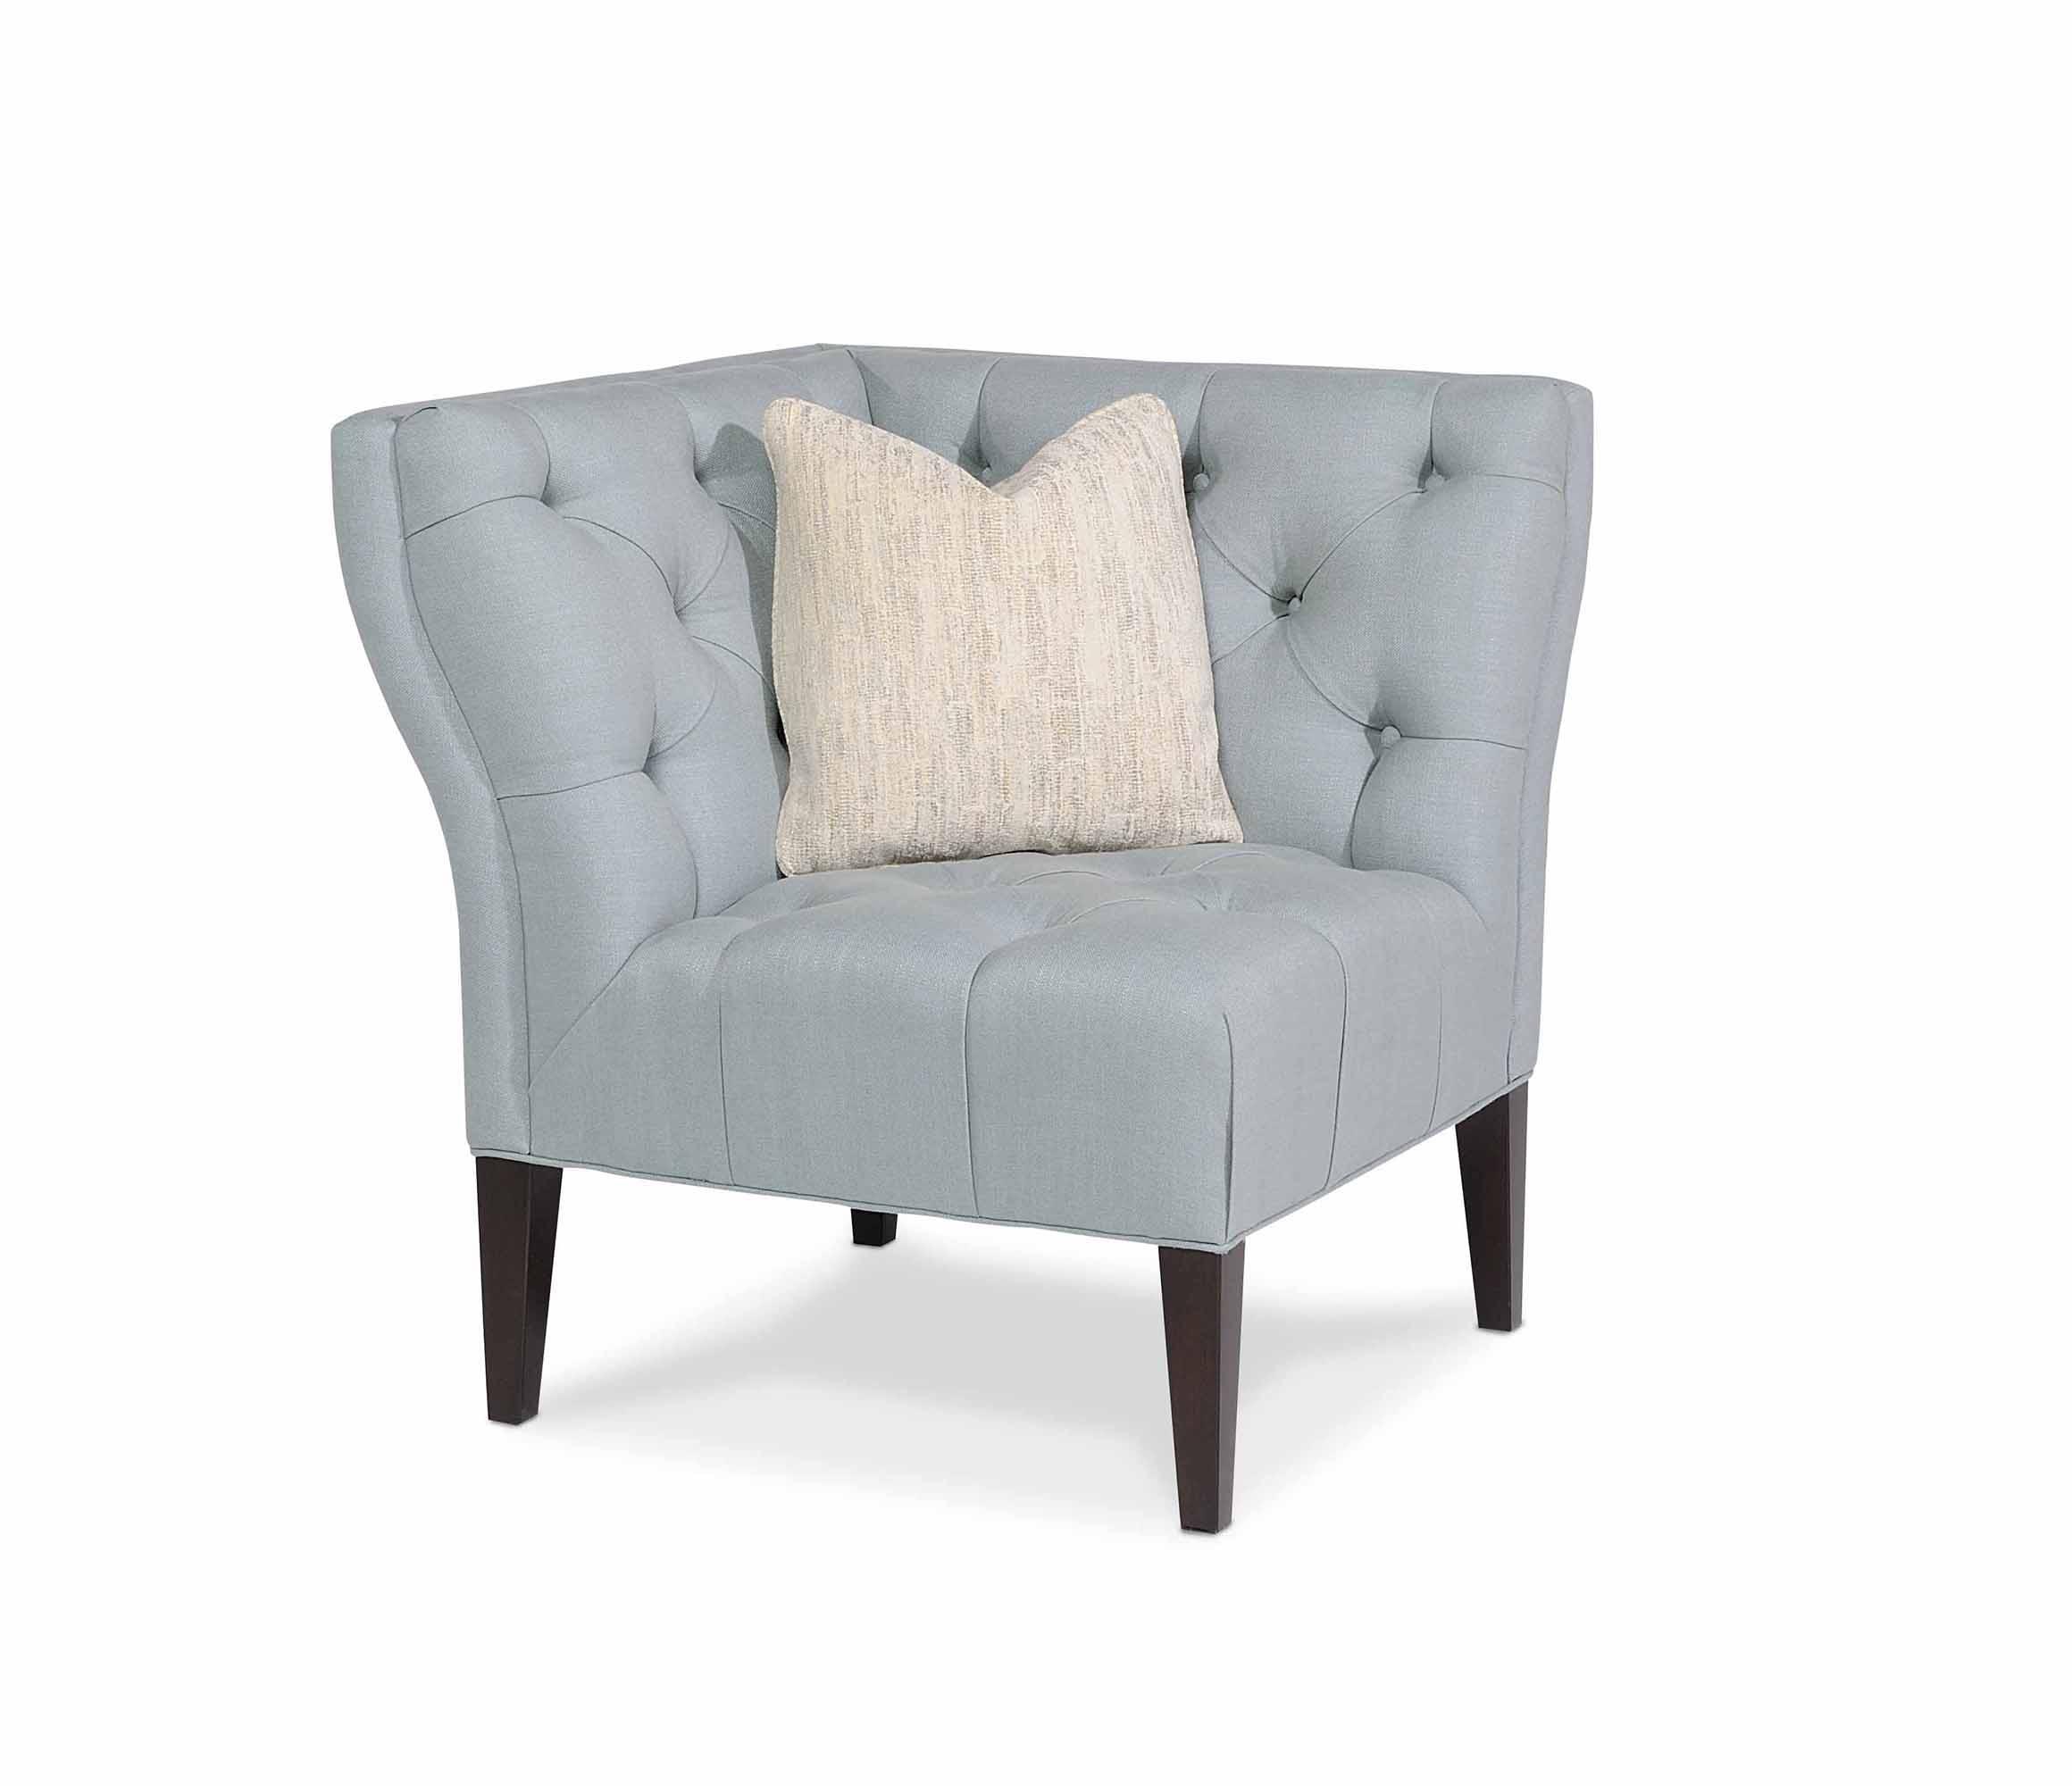 Taylor King Living Room Adair Corner Chair 2315 15 Studio